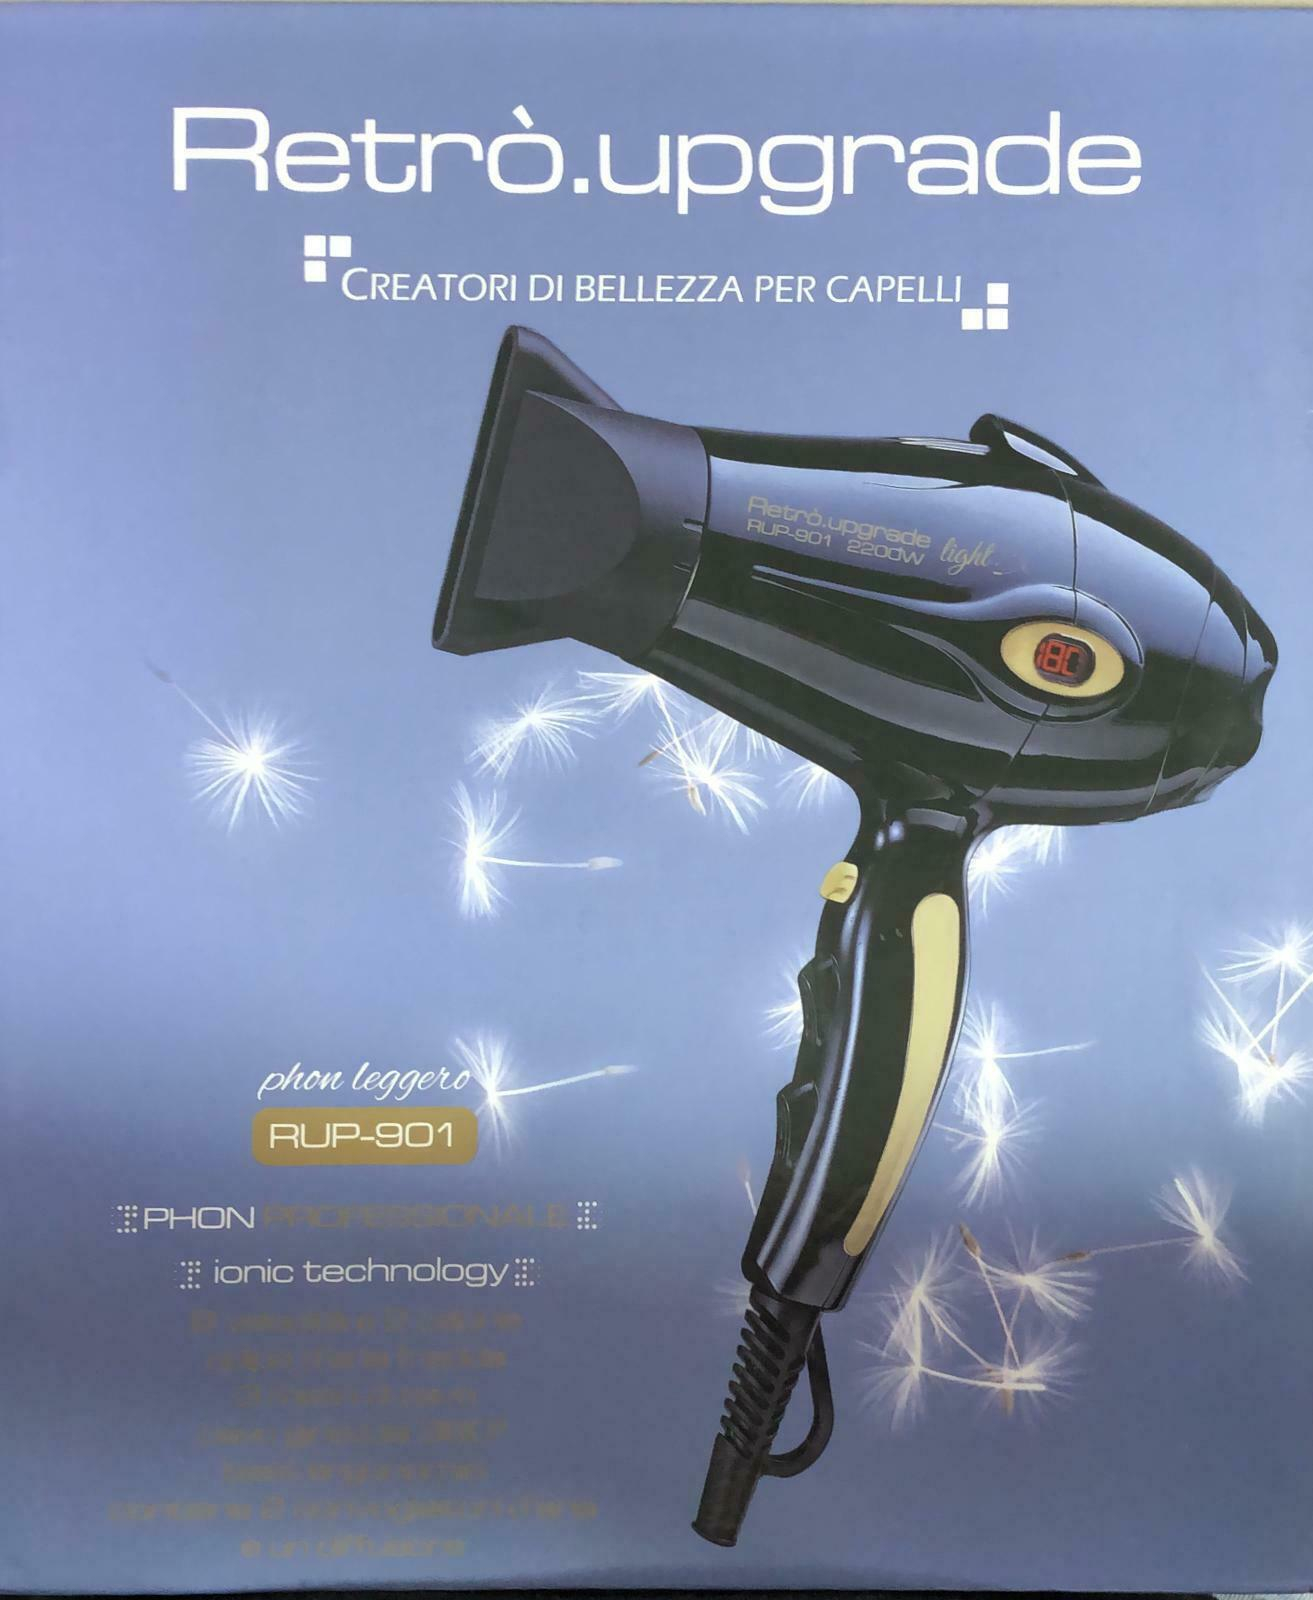 Retrò.upgrade - Phon RUP-901